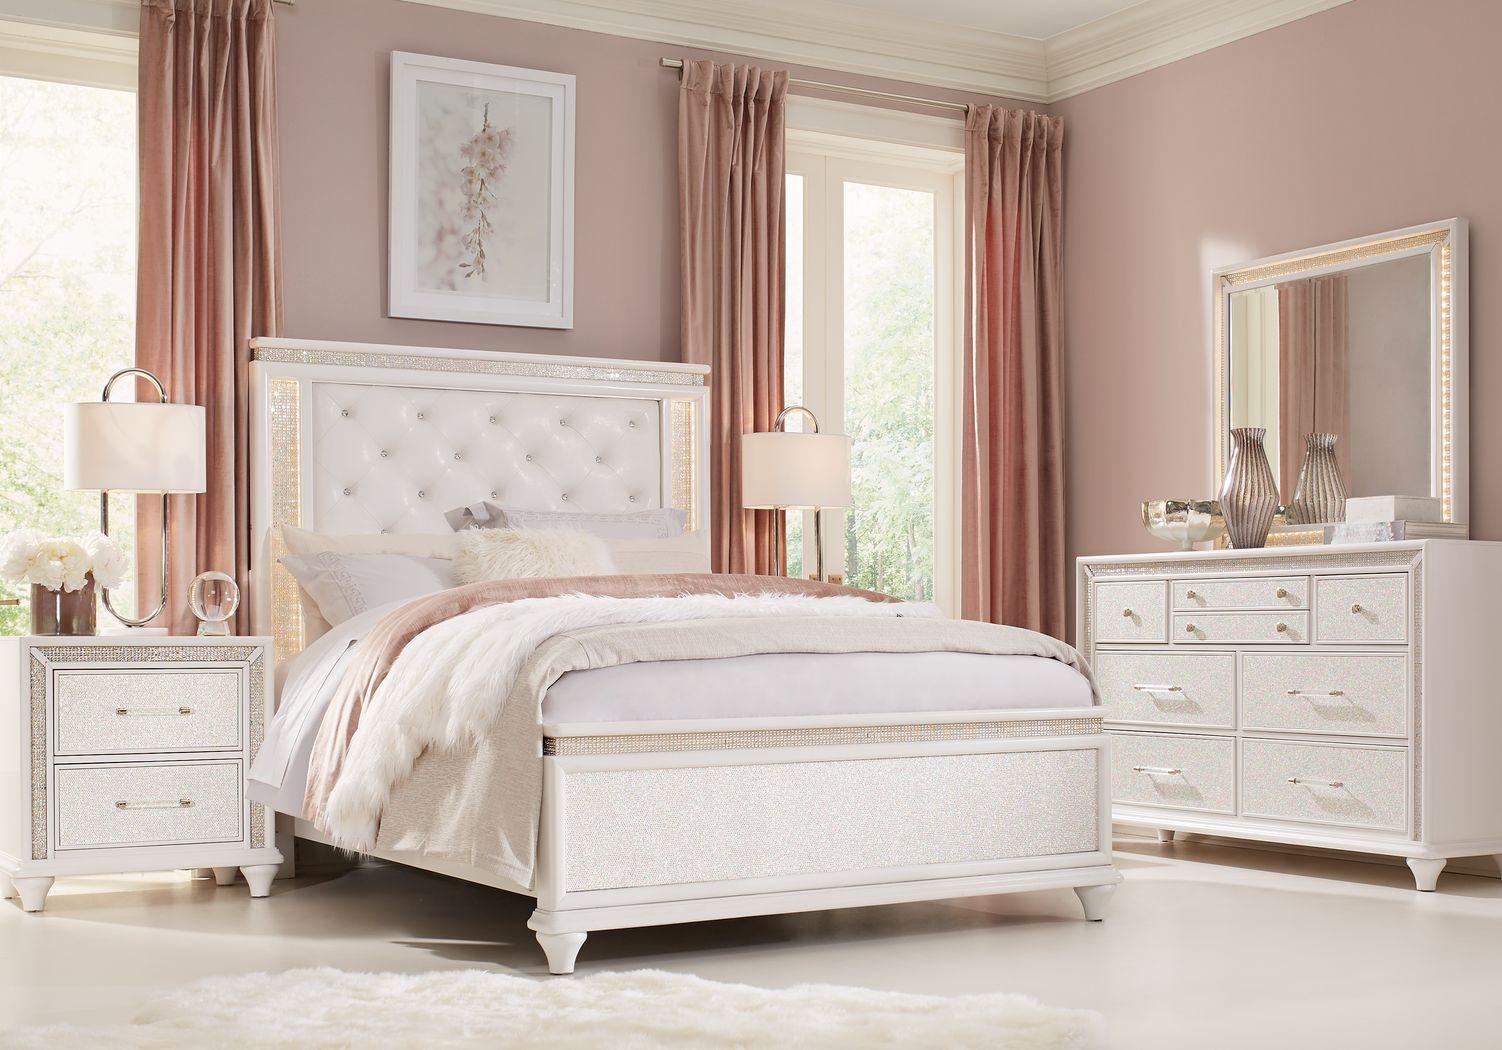 Sofia Vergara Vegas White 7 Pc King Panel Bedroom